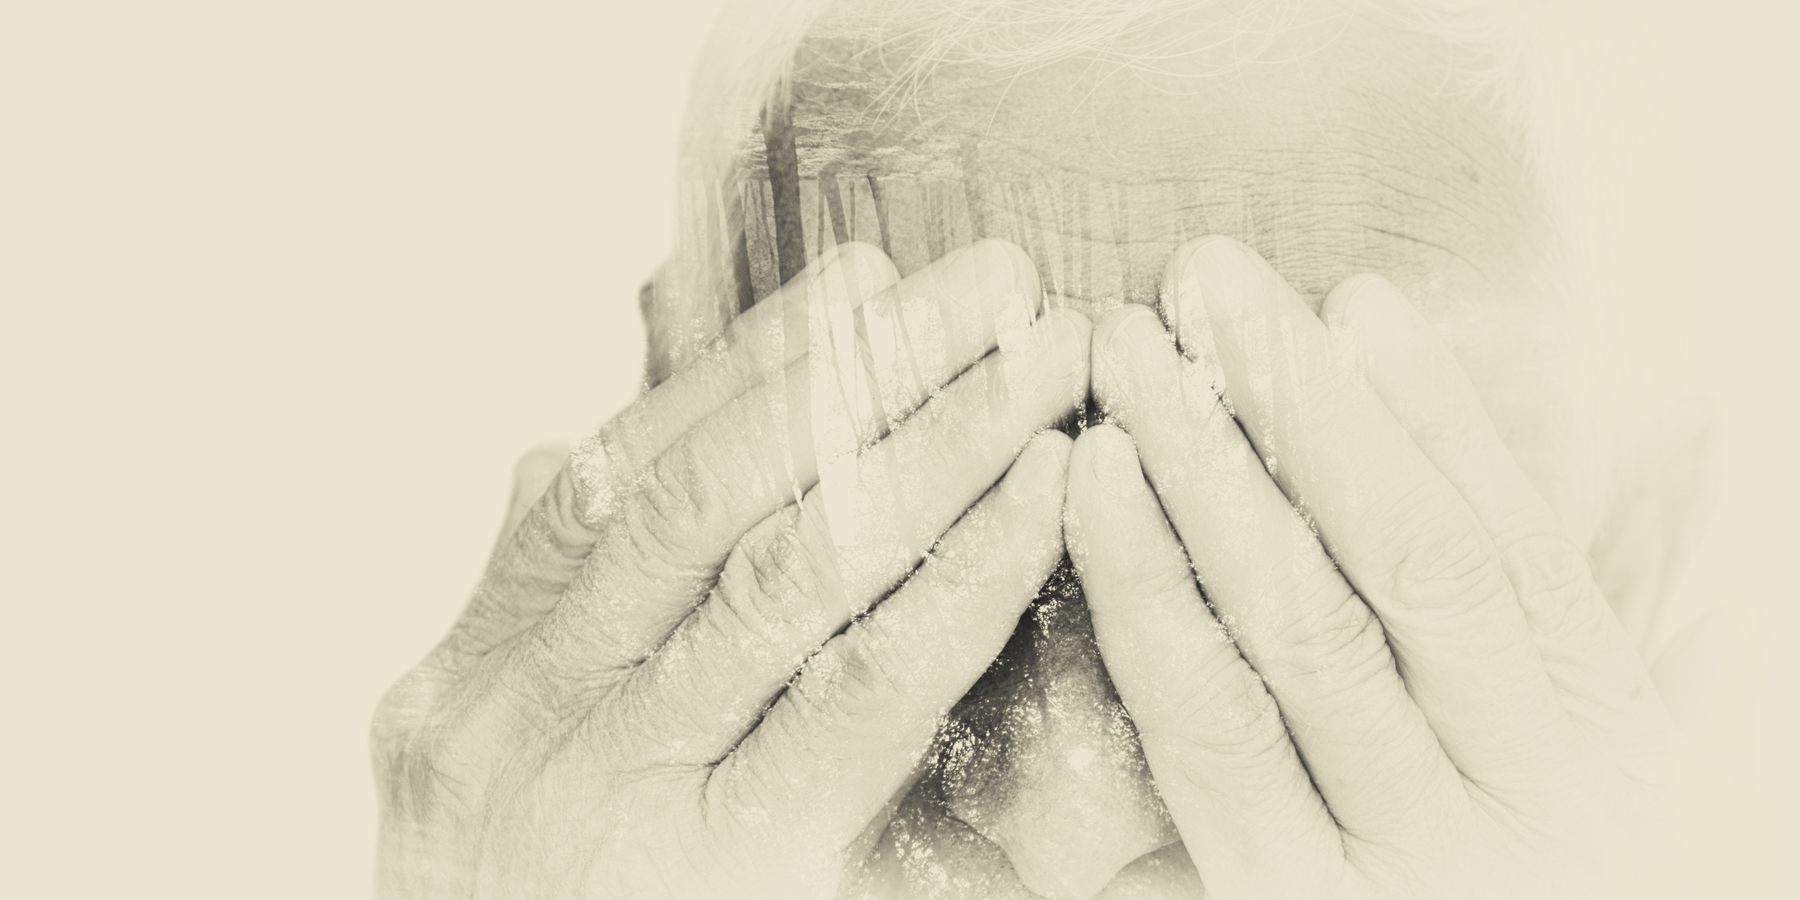 Statutes to Combat Elder Abuse in Nursing Homes | Journal of ...